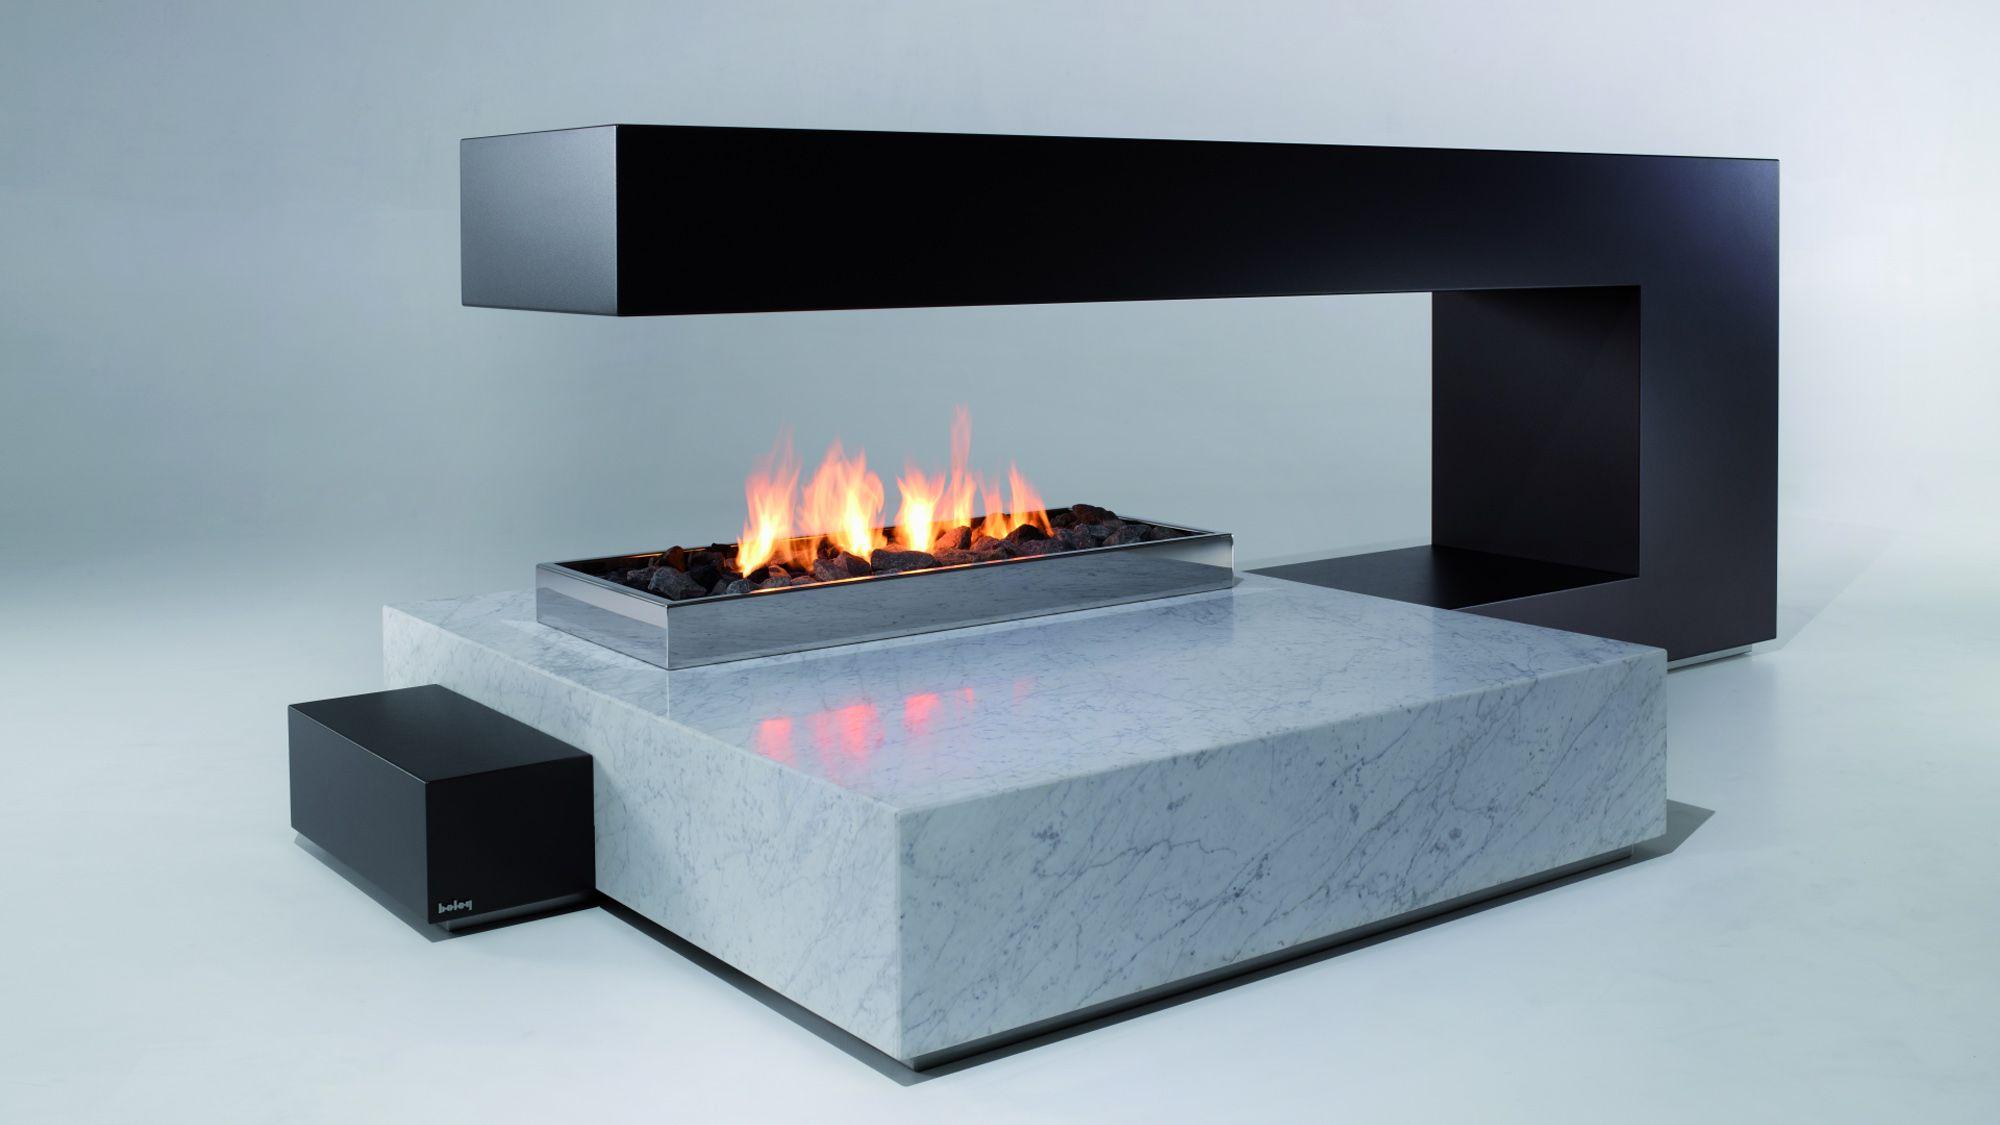 Fireplace: standalone fireplace paperclip